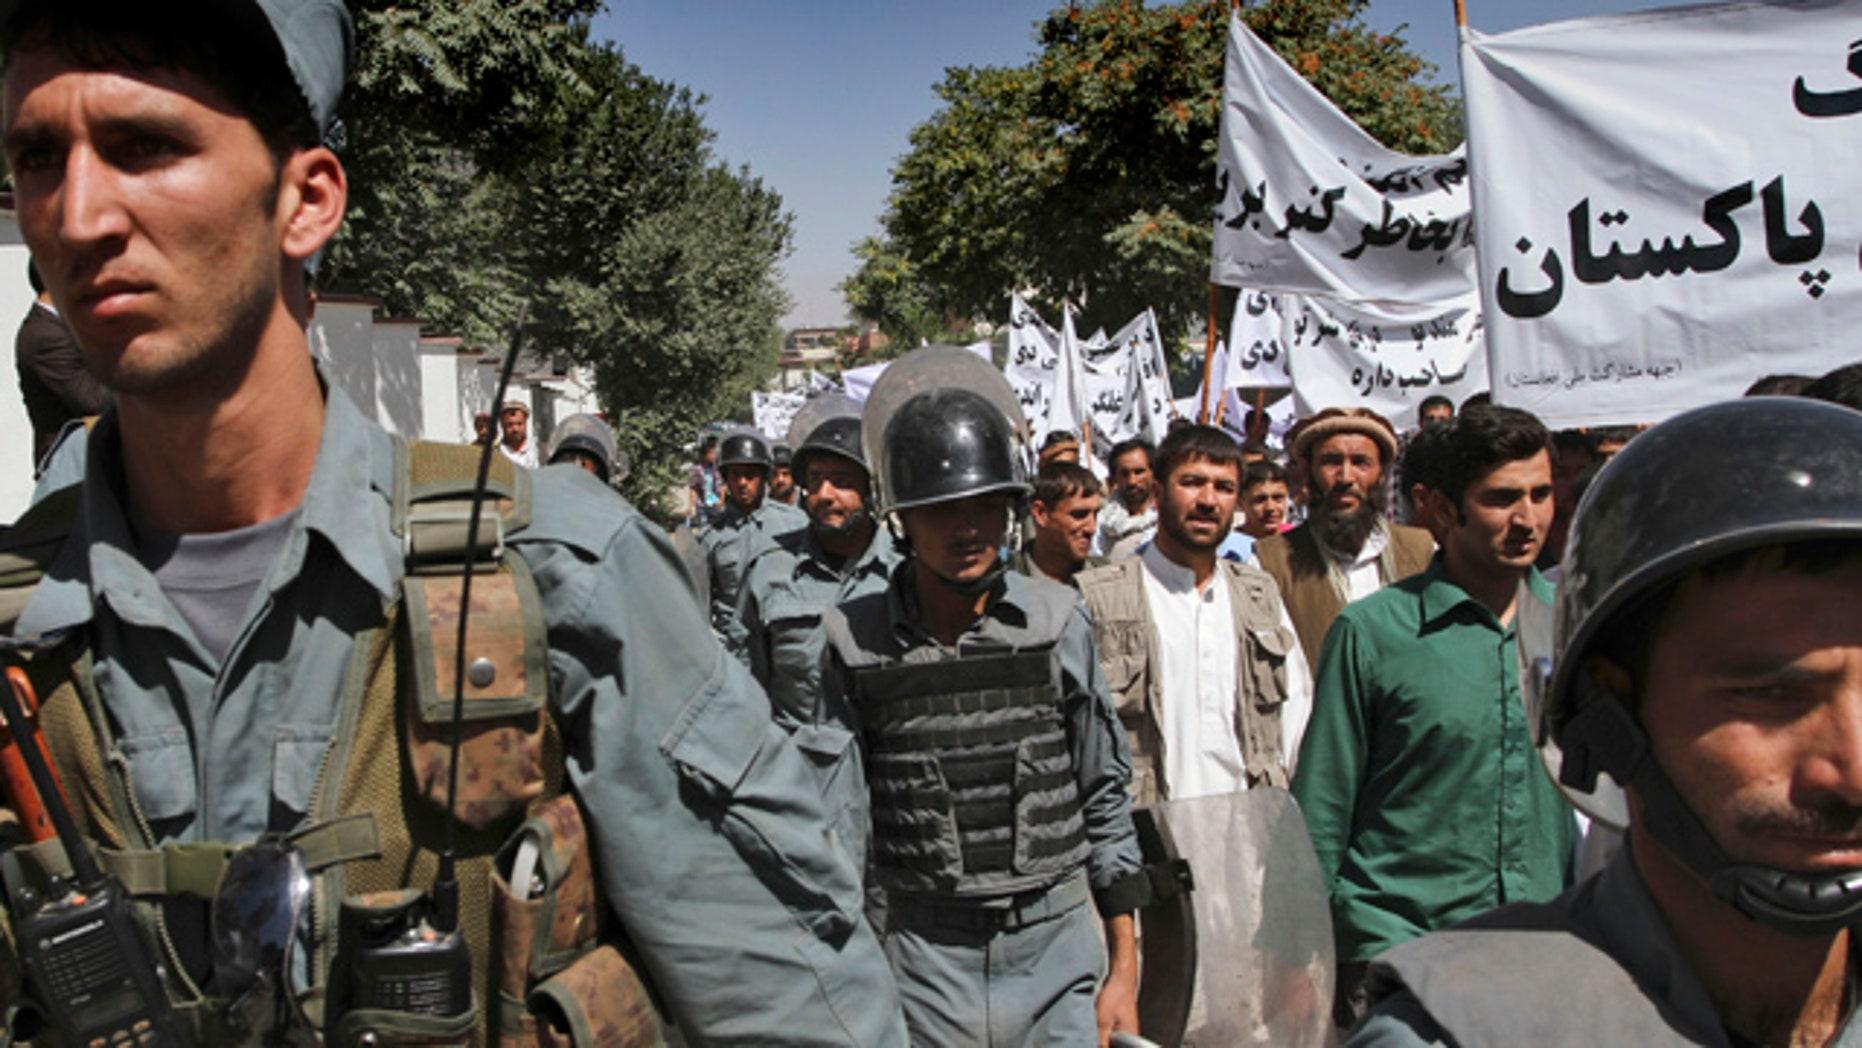 July 2: Afghan policemen escort protestors during an anti-Pakistan demonstration in Kabul, Afghanistan.